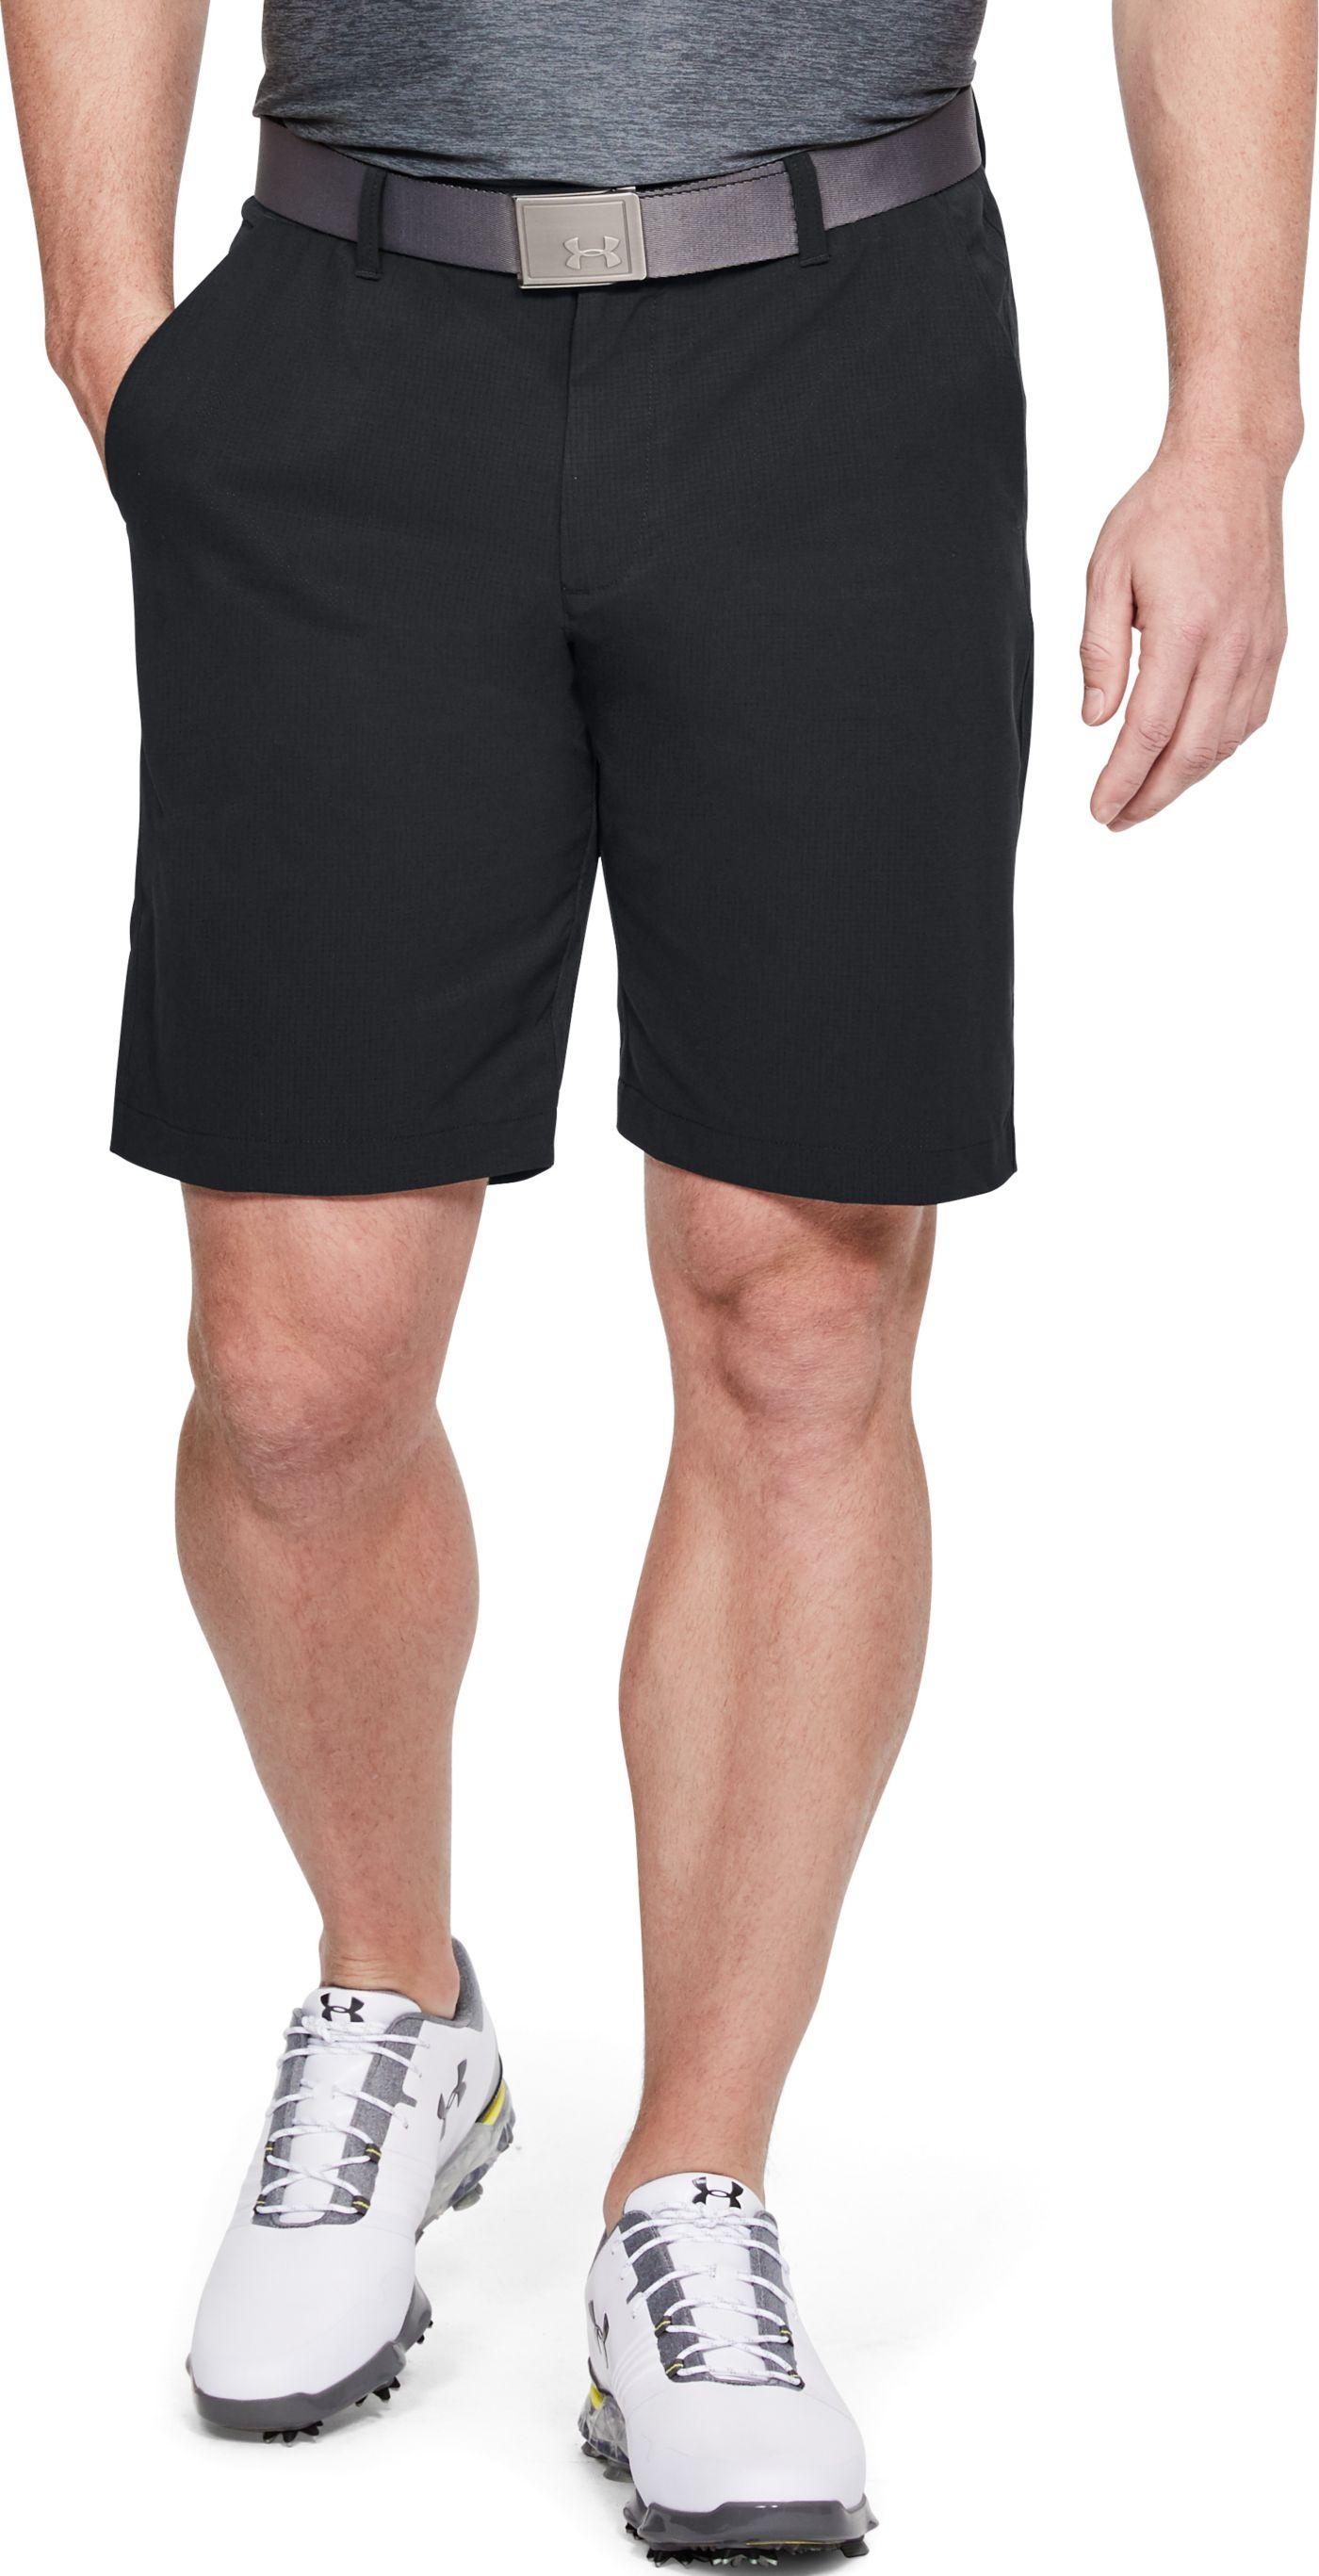 Under Armour Men's Showdown Taper Vented Golf Shorts